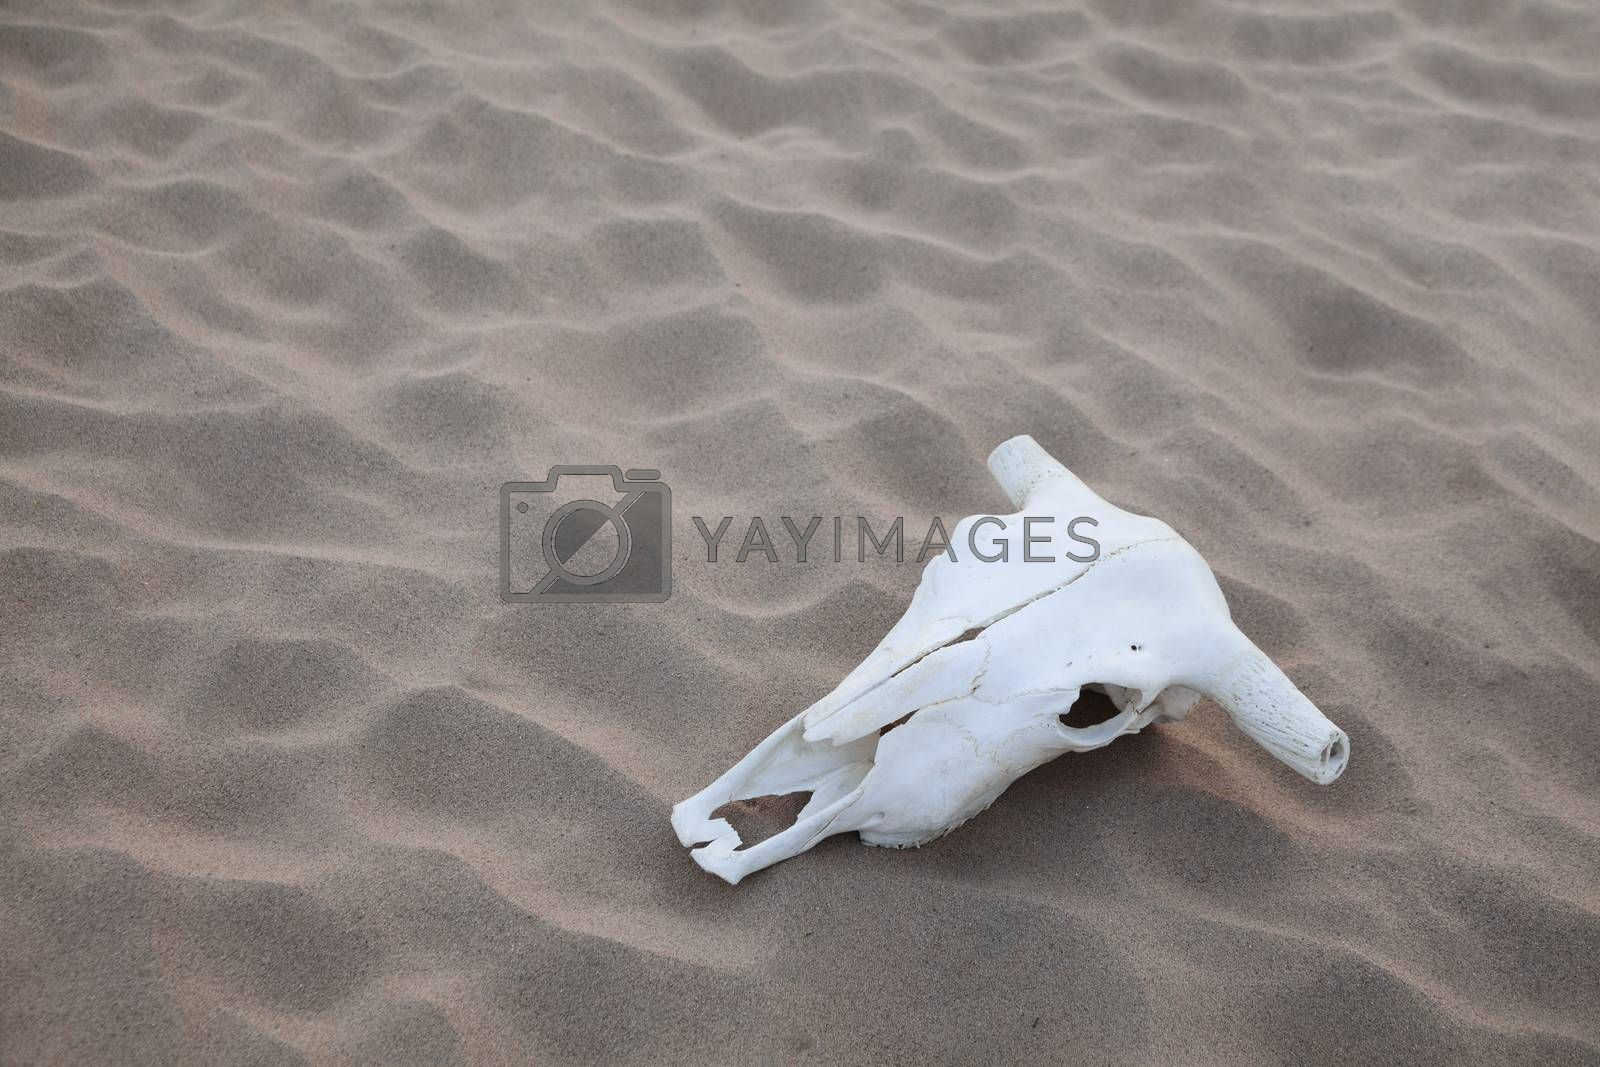 Animal skull lying on the sand in the middle of the desert